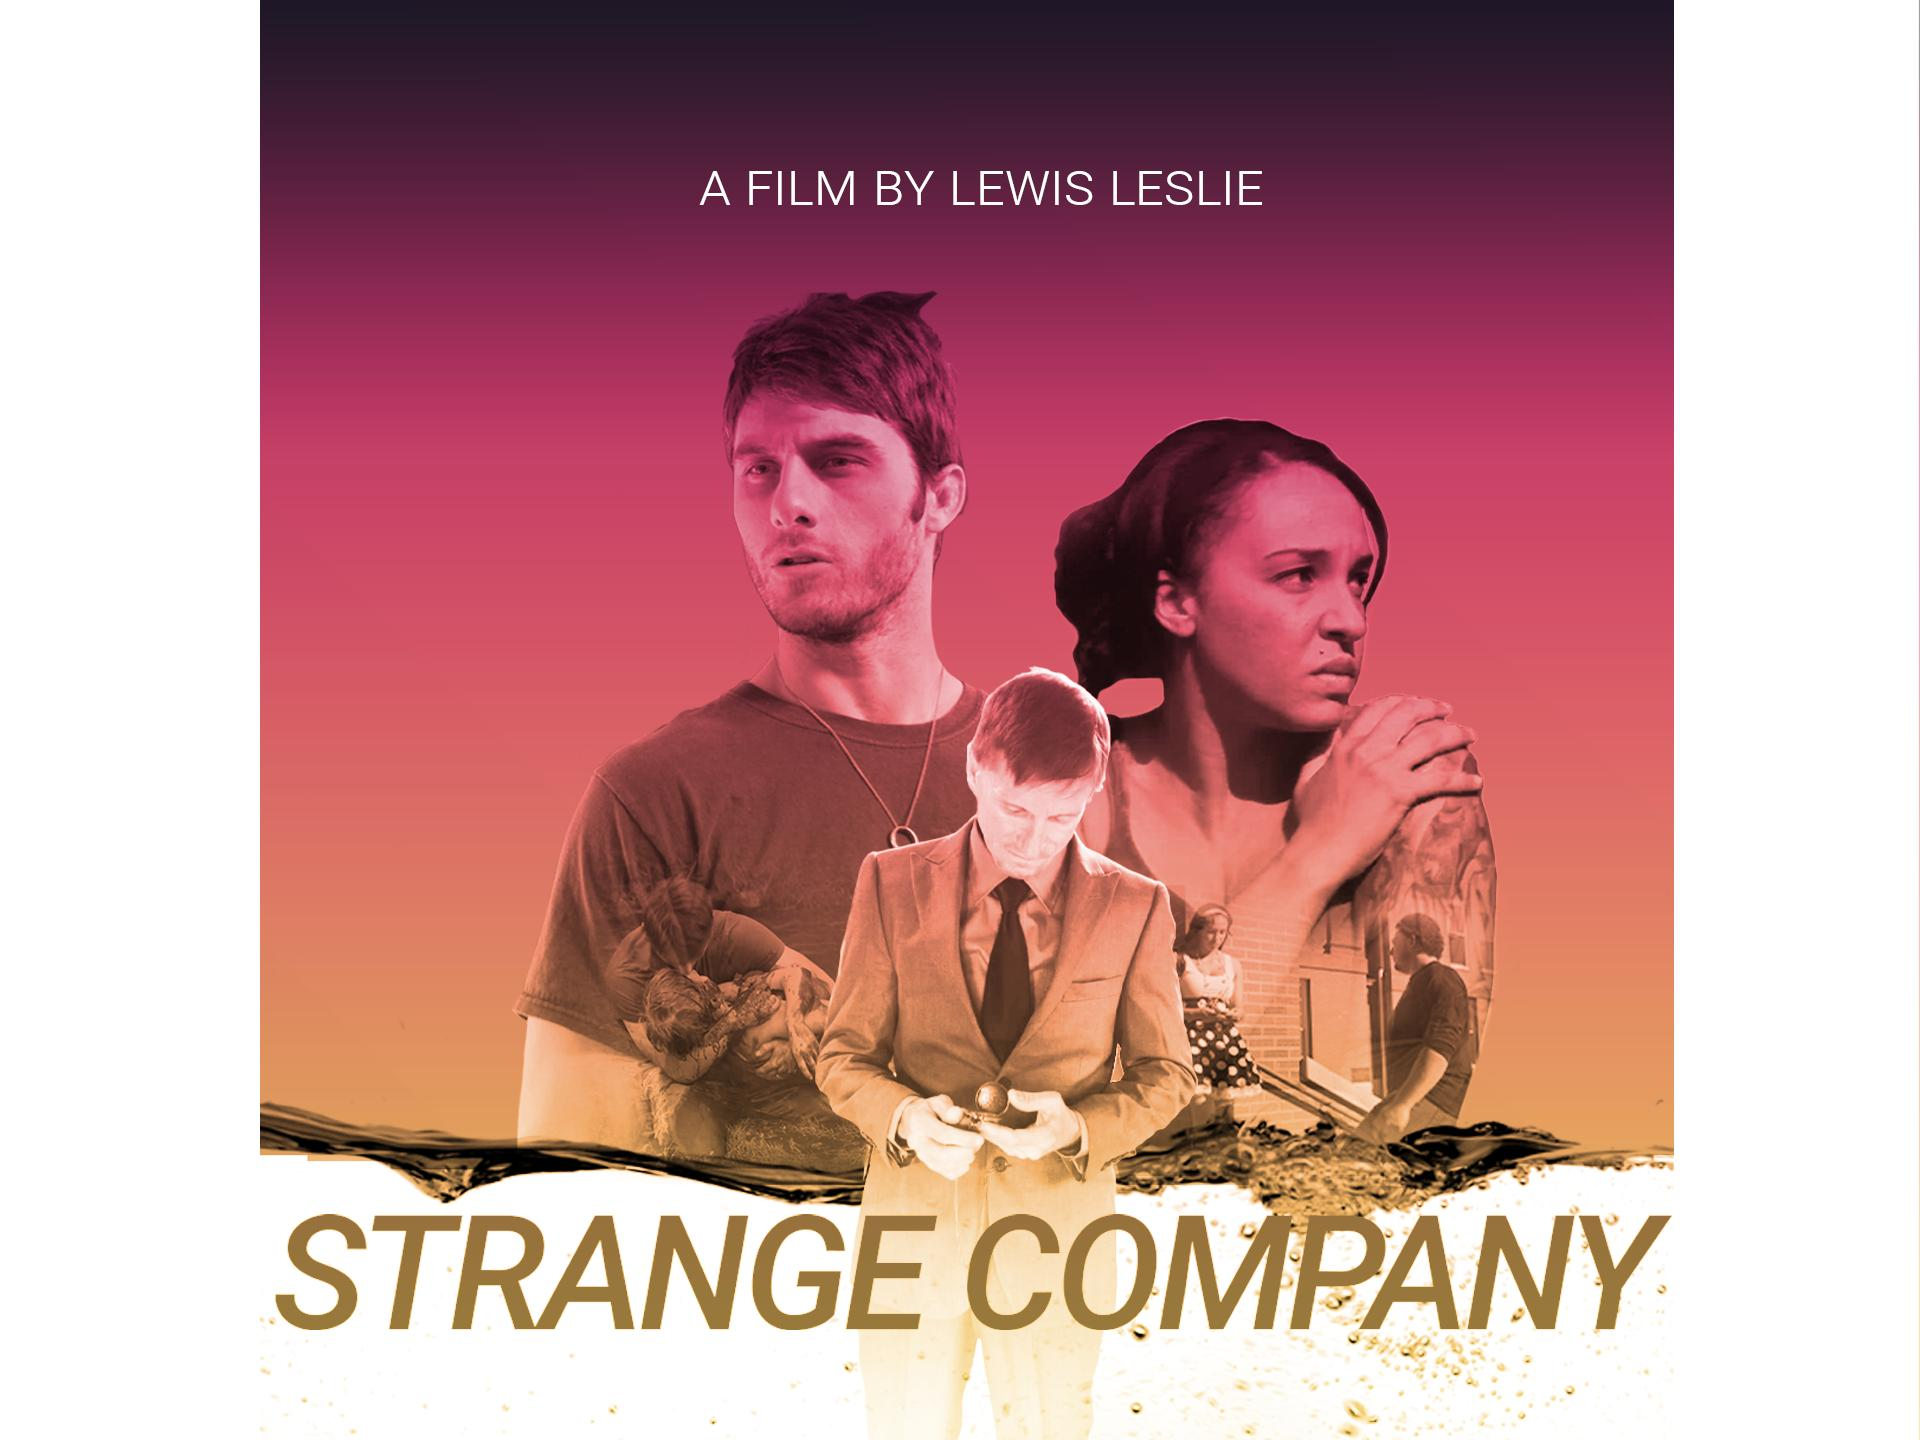 Strange Company poster image